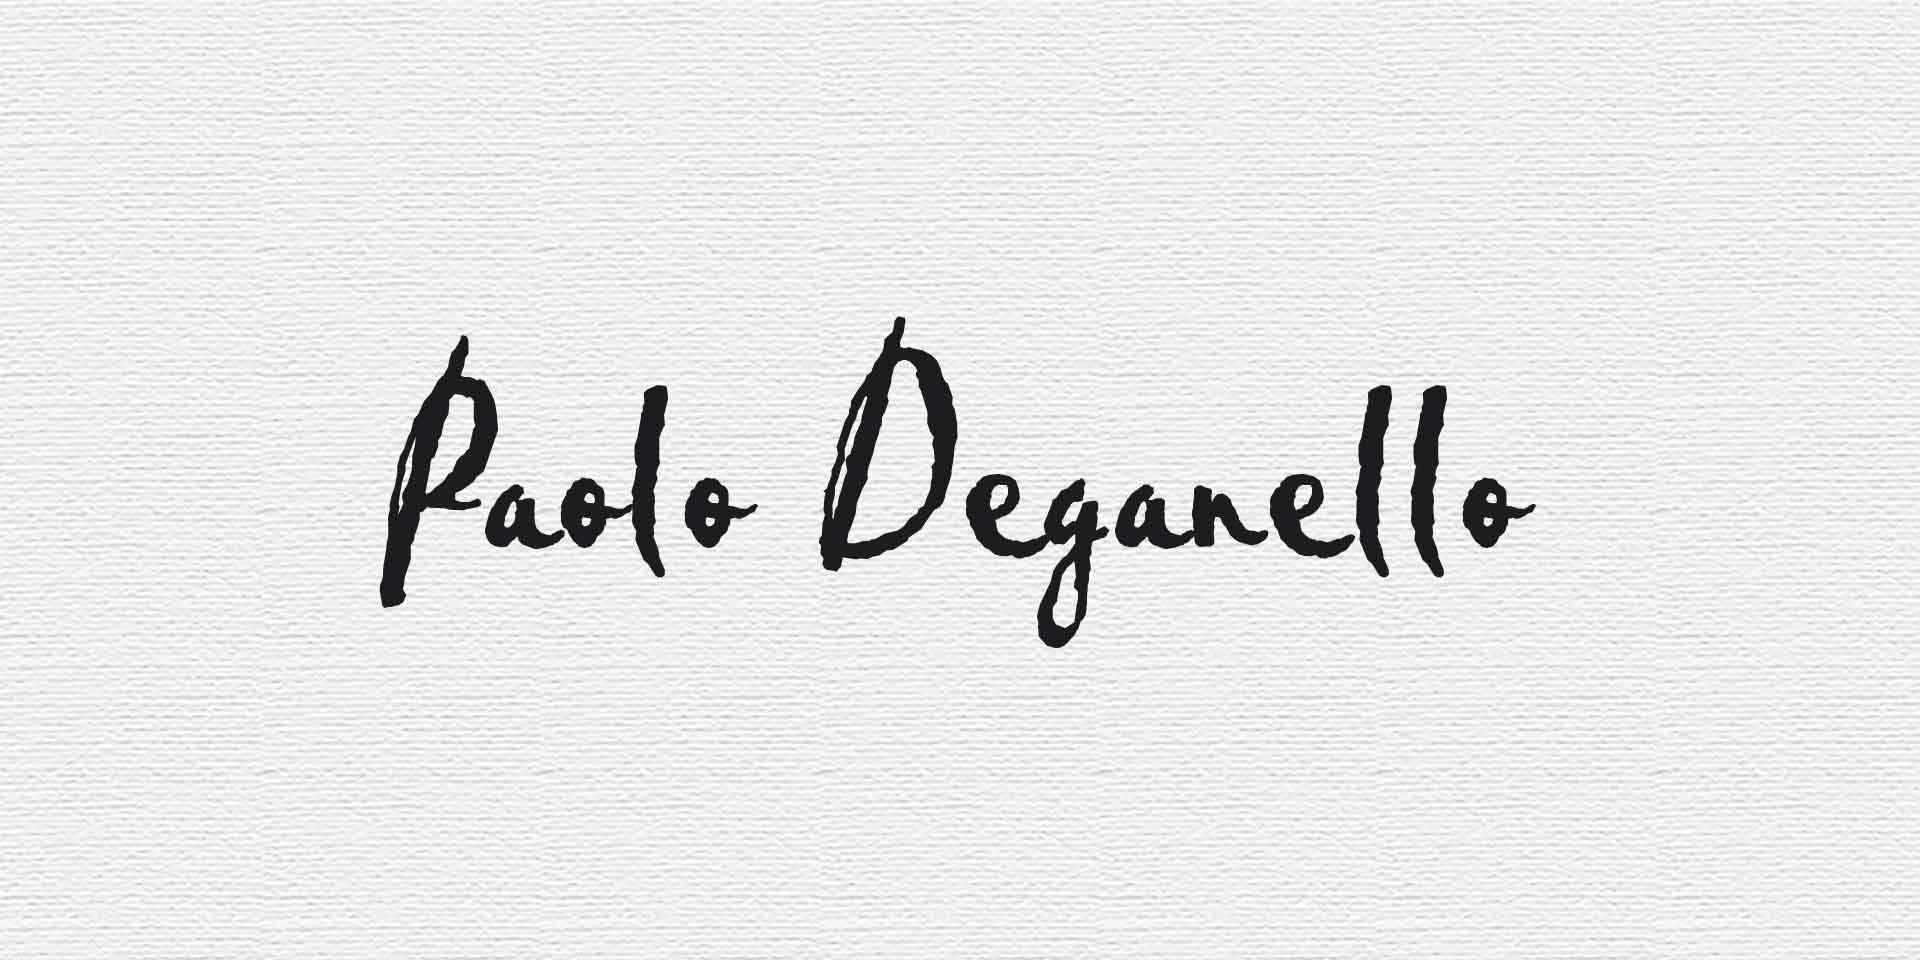 Paolo Deganello